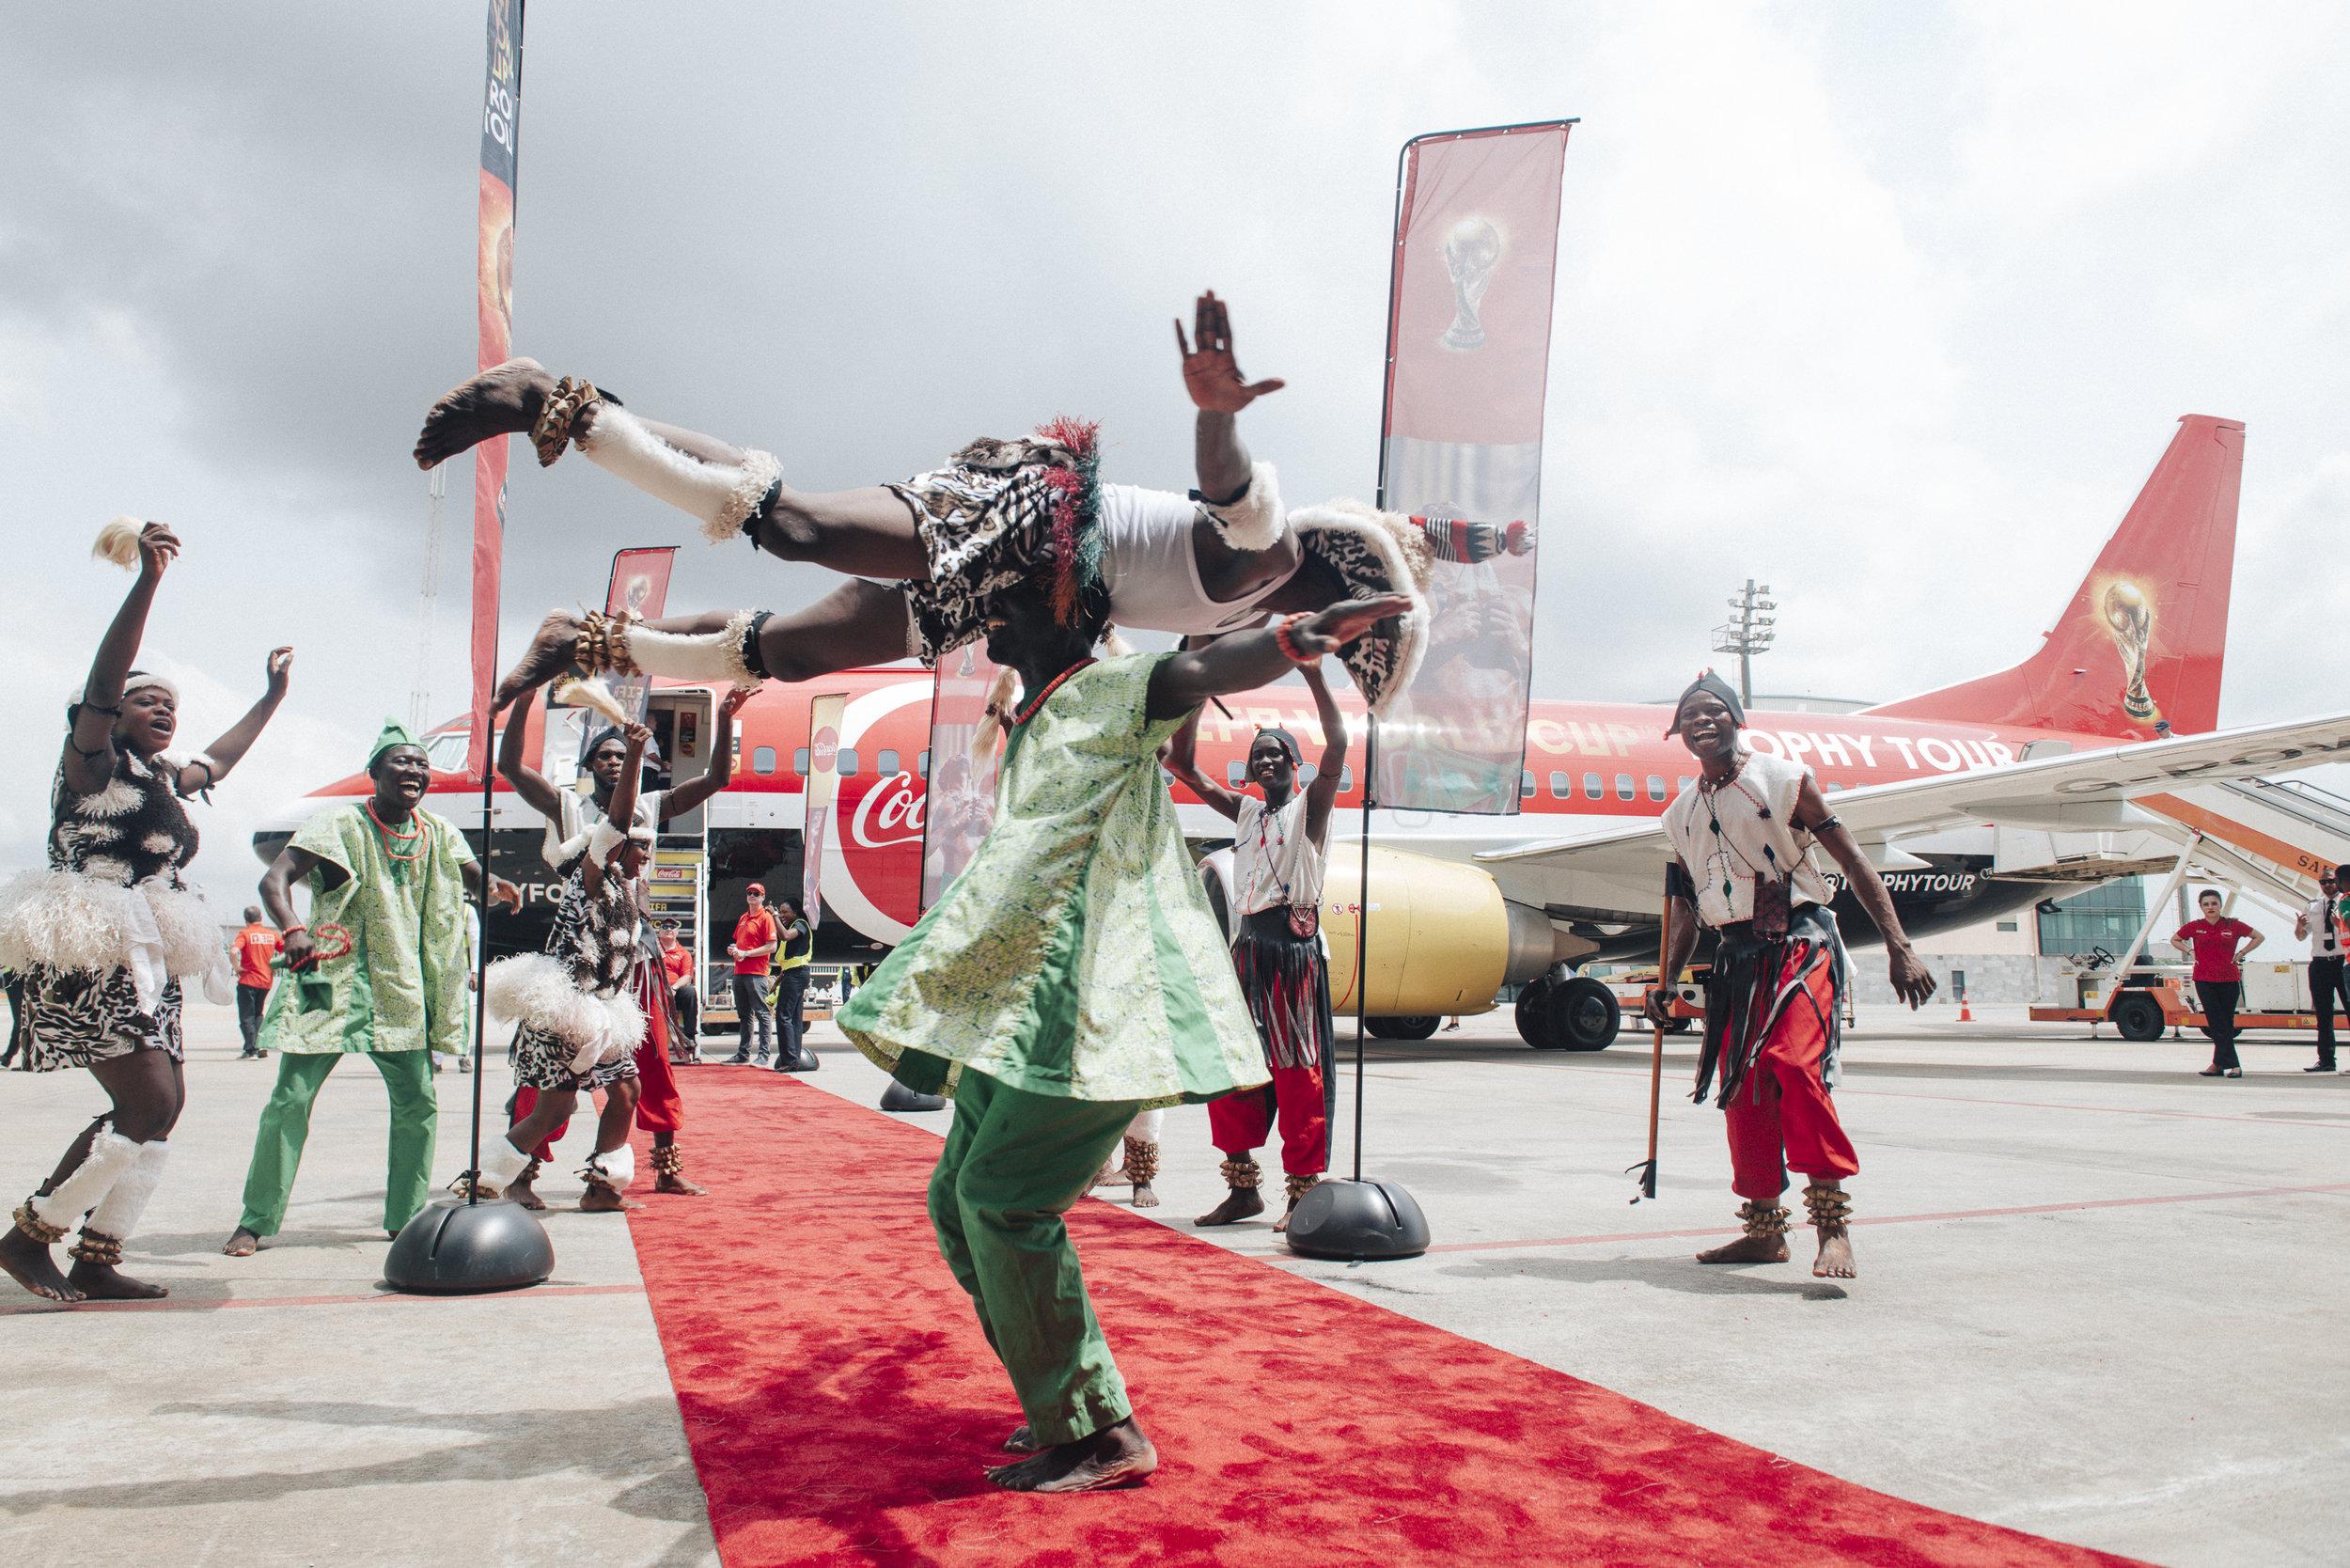 20180209_LAOGS_NIGERIA_0596.jpg